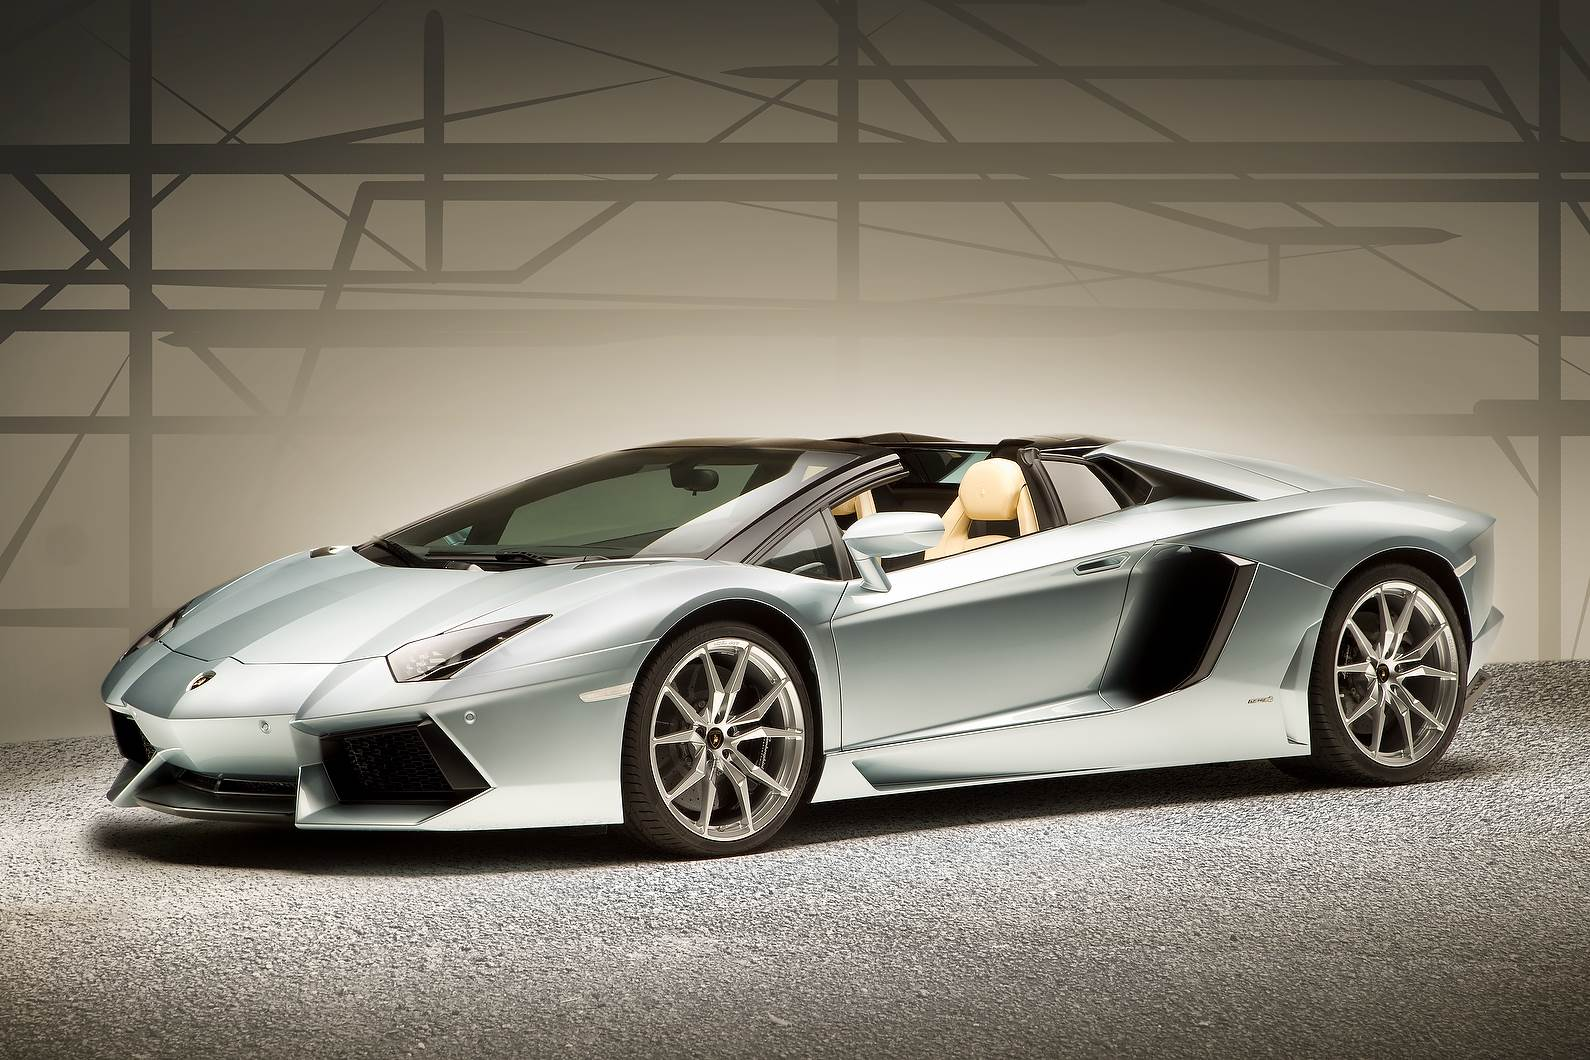 Lamborghini Aventador Roadster photo gallery